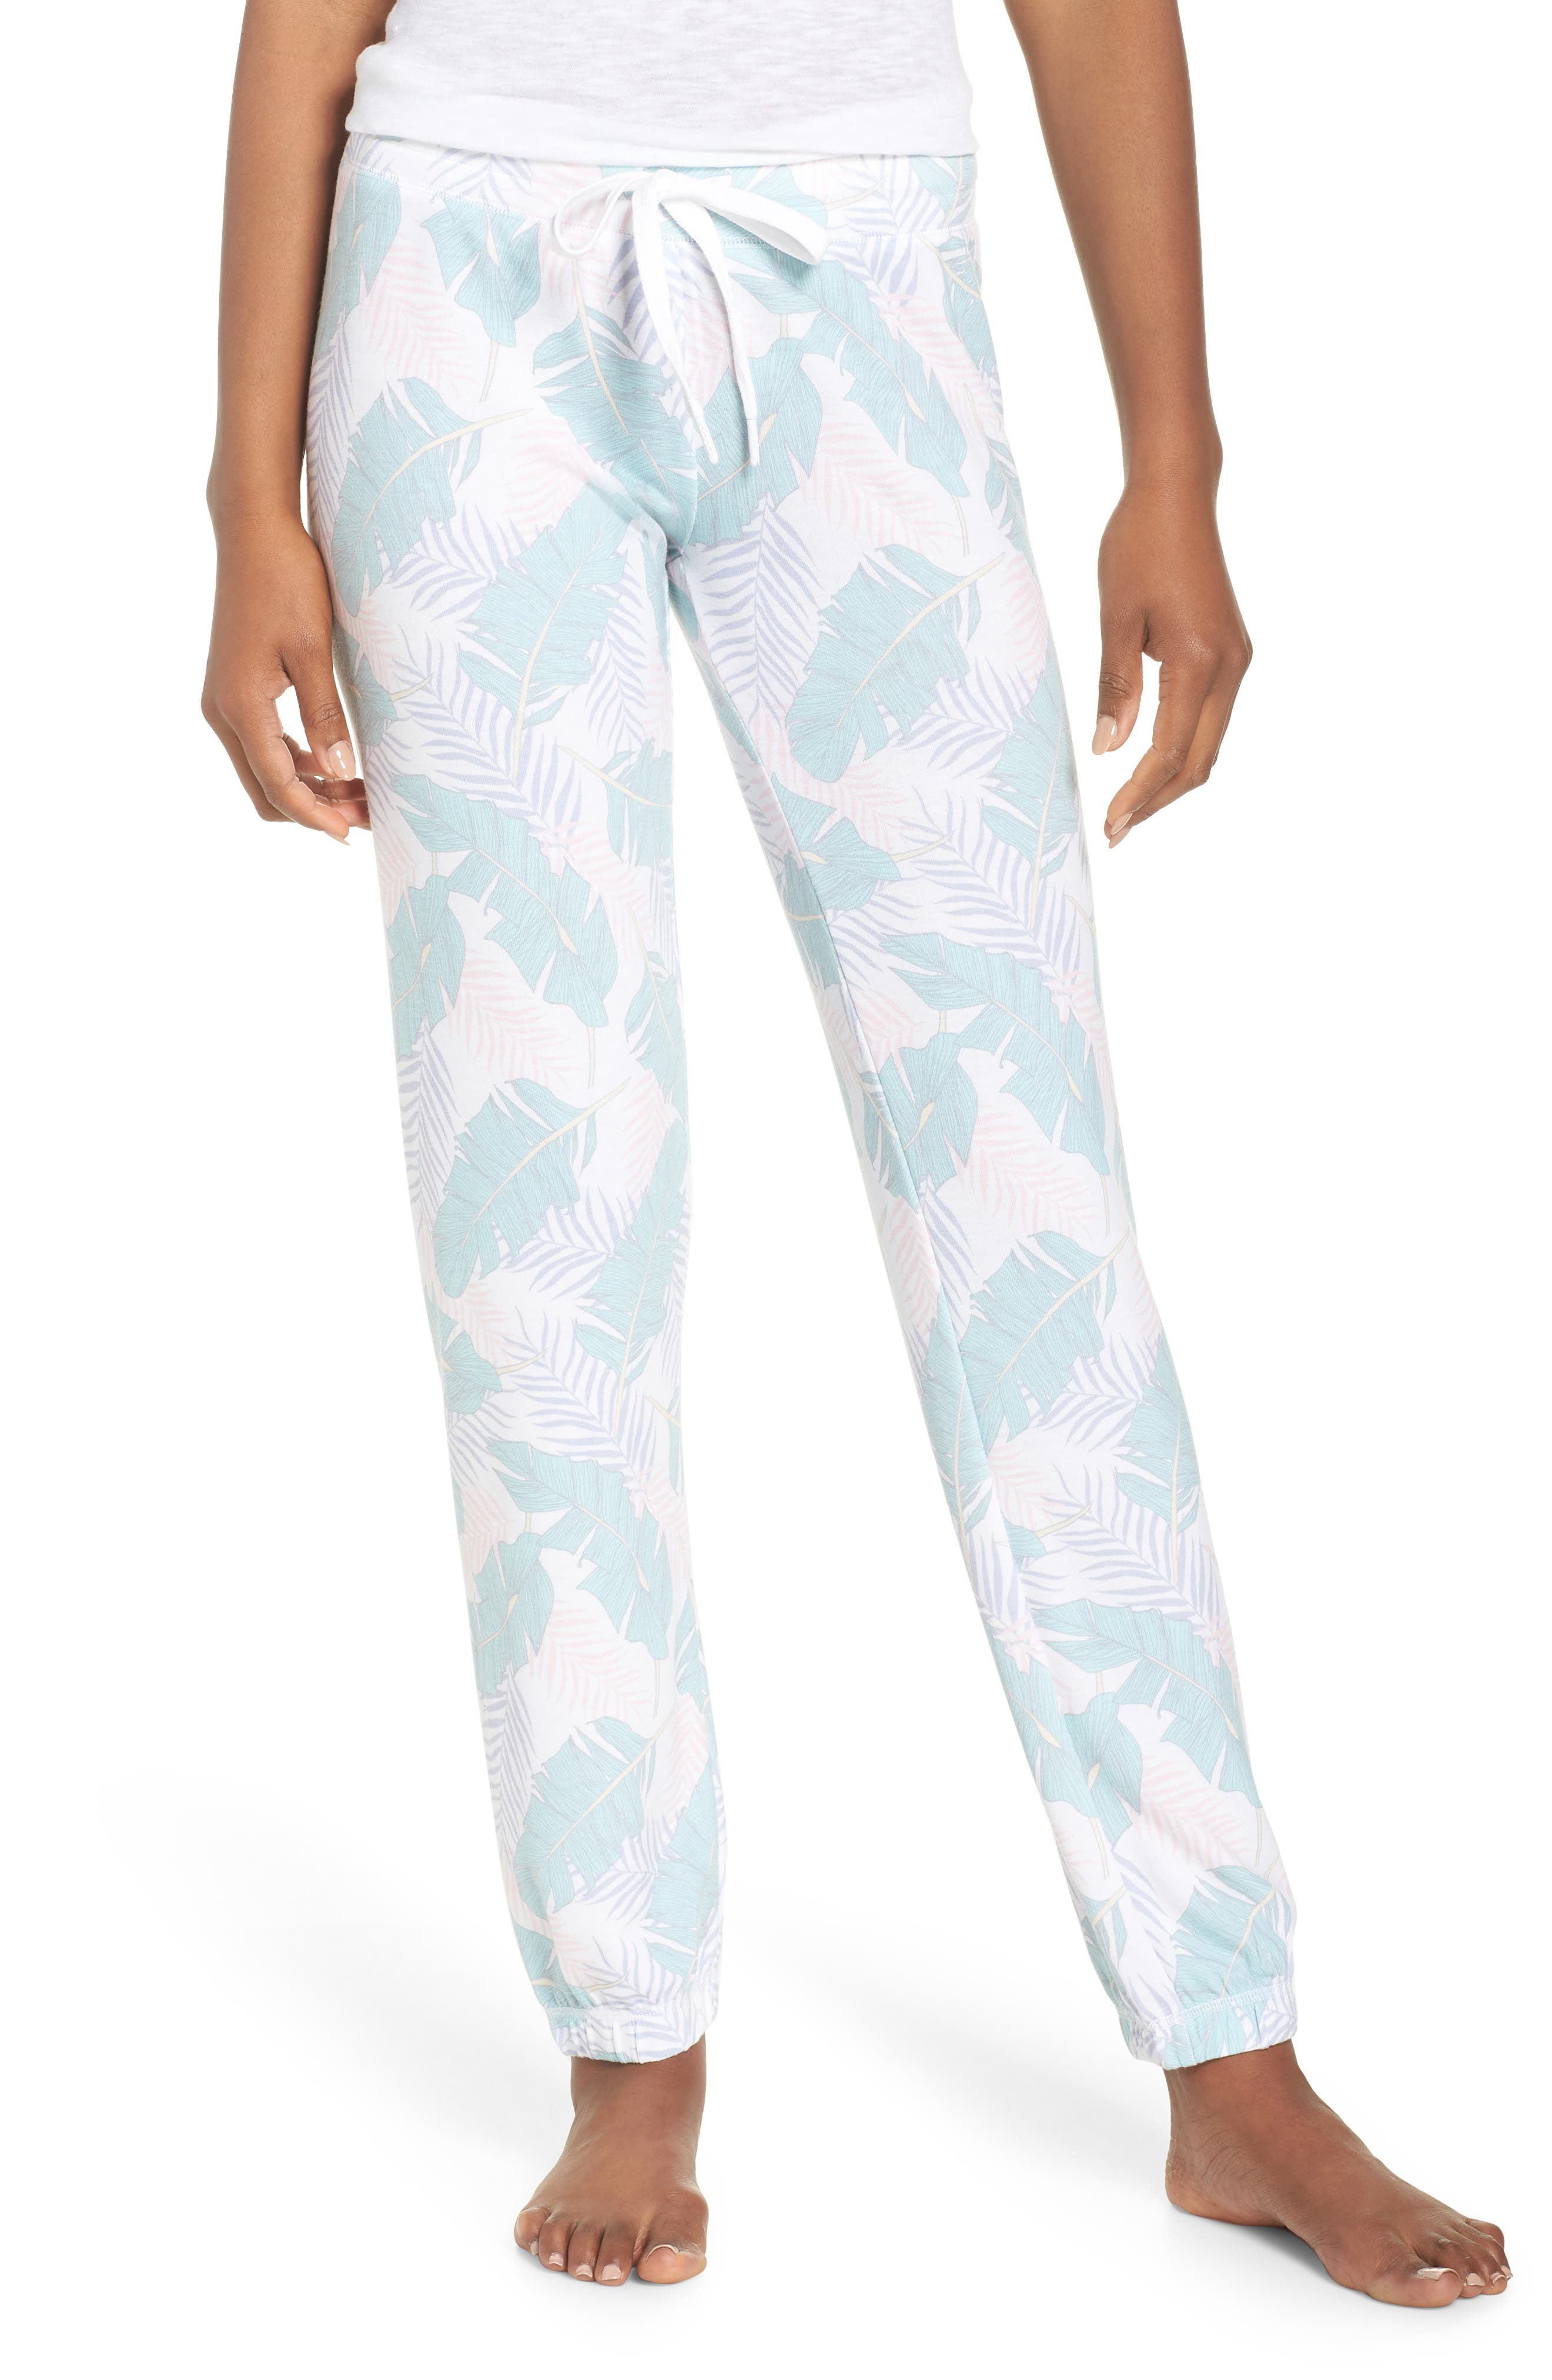 Peachy Jogger Lounge Pants,                             Main thumbnail 1, color,                             White